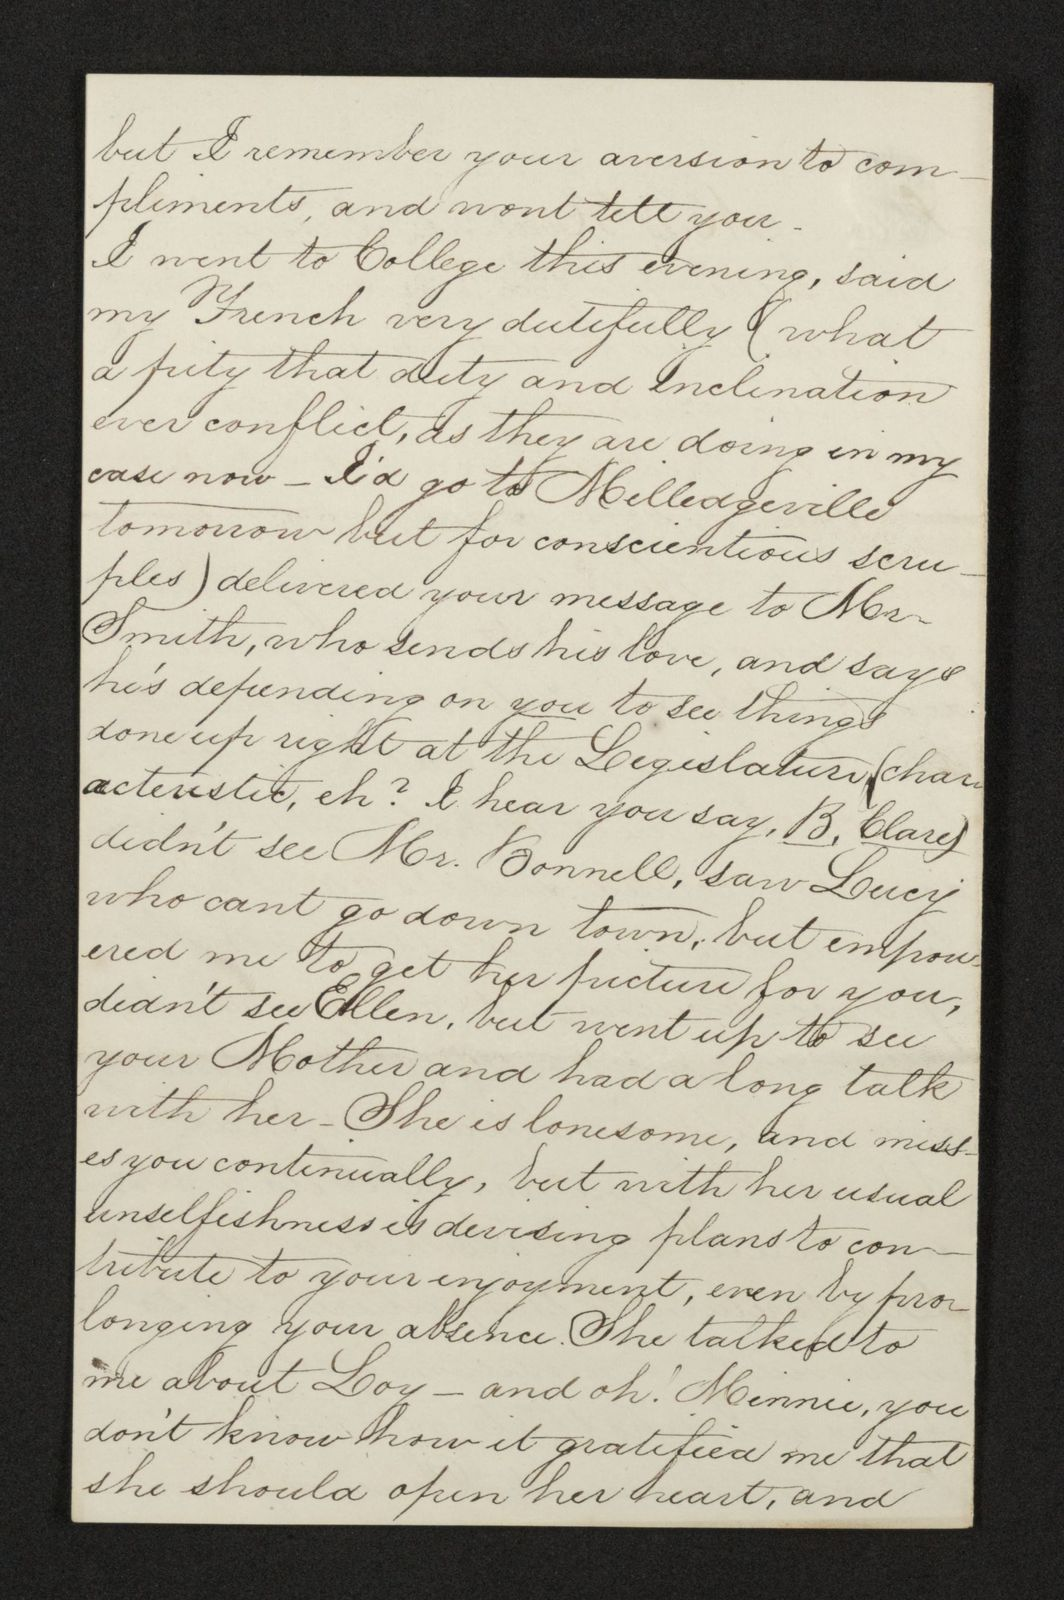 Lewis H. Machen Family Papers: Gresham Family Correspondence, 1834-1925; 1866